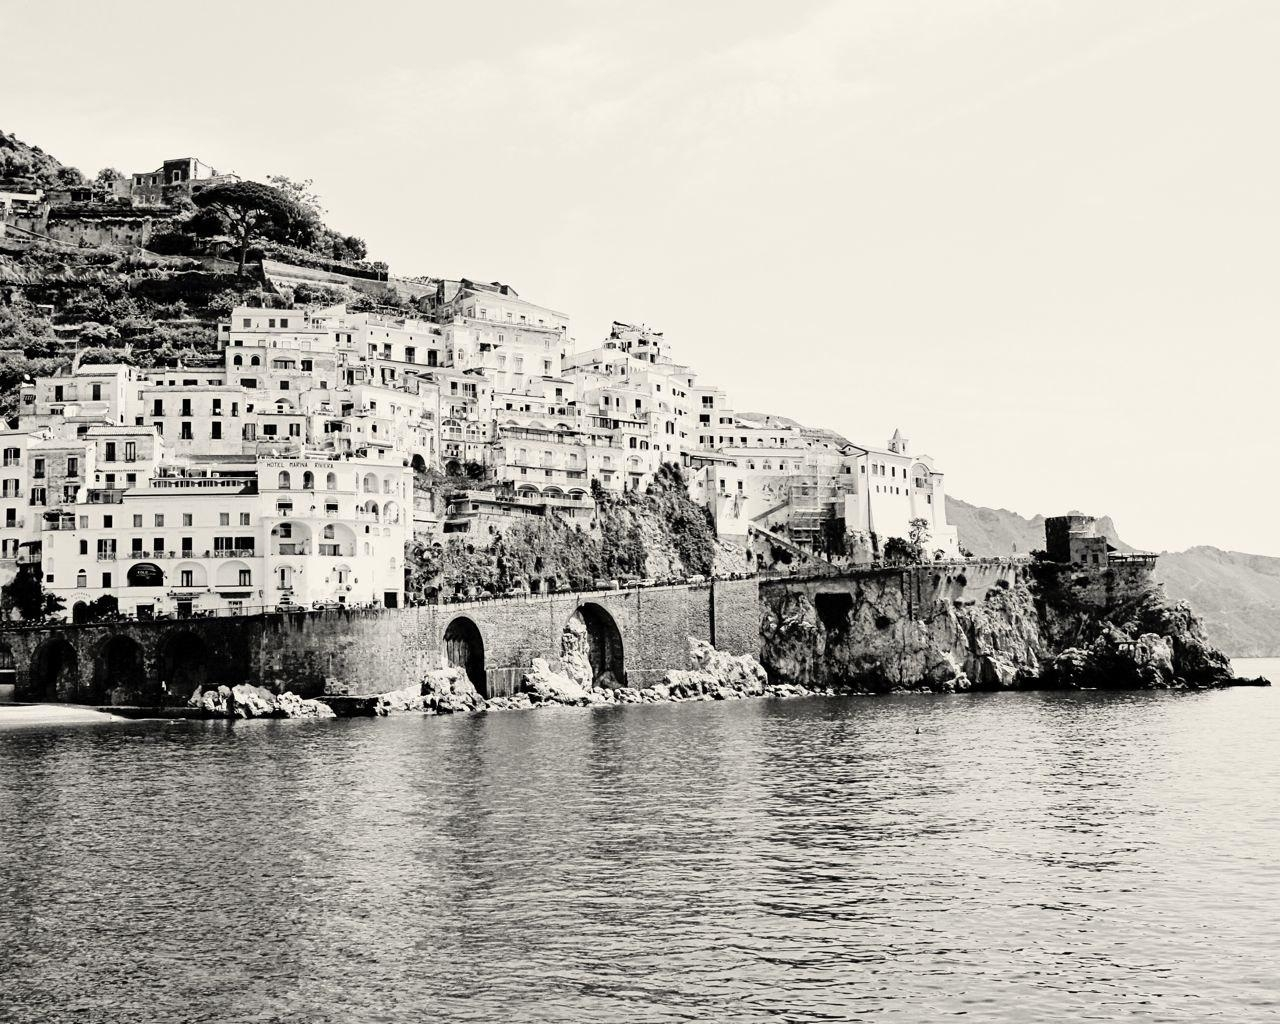 Amalfi Photography Black And White Italy Photography Inside Black And White Italian Wall Art (Image 4 of 20)